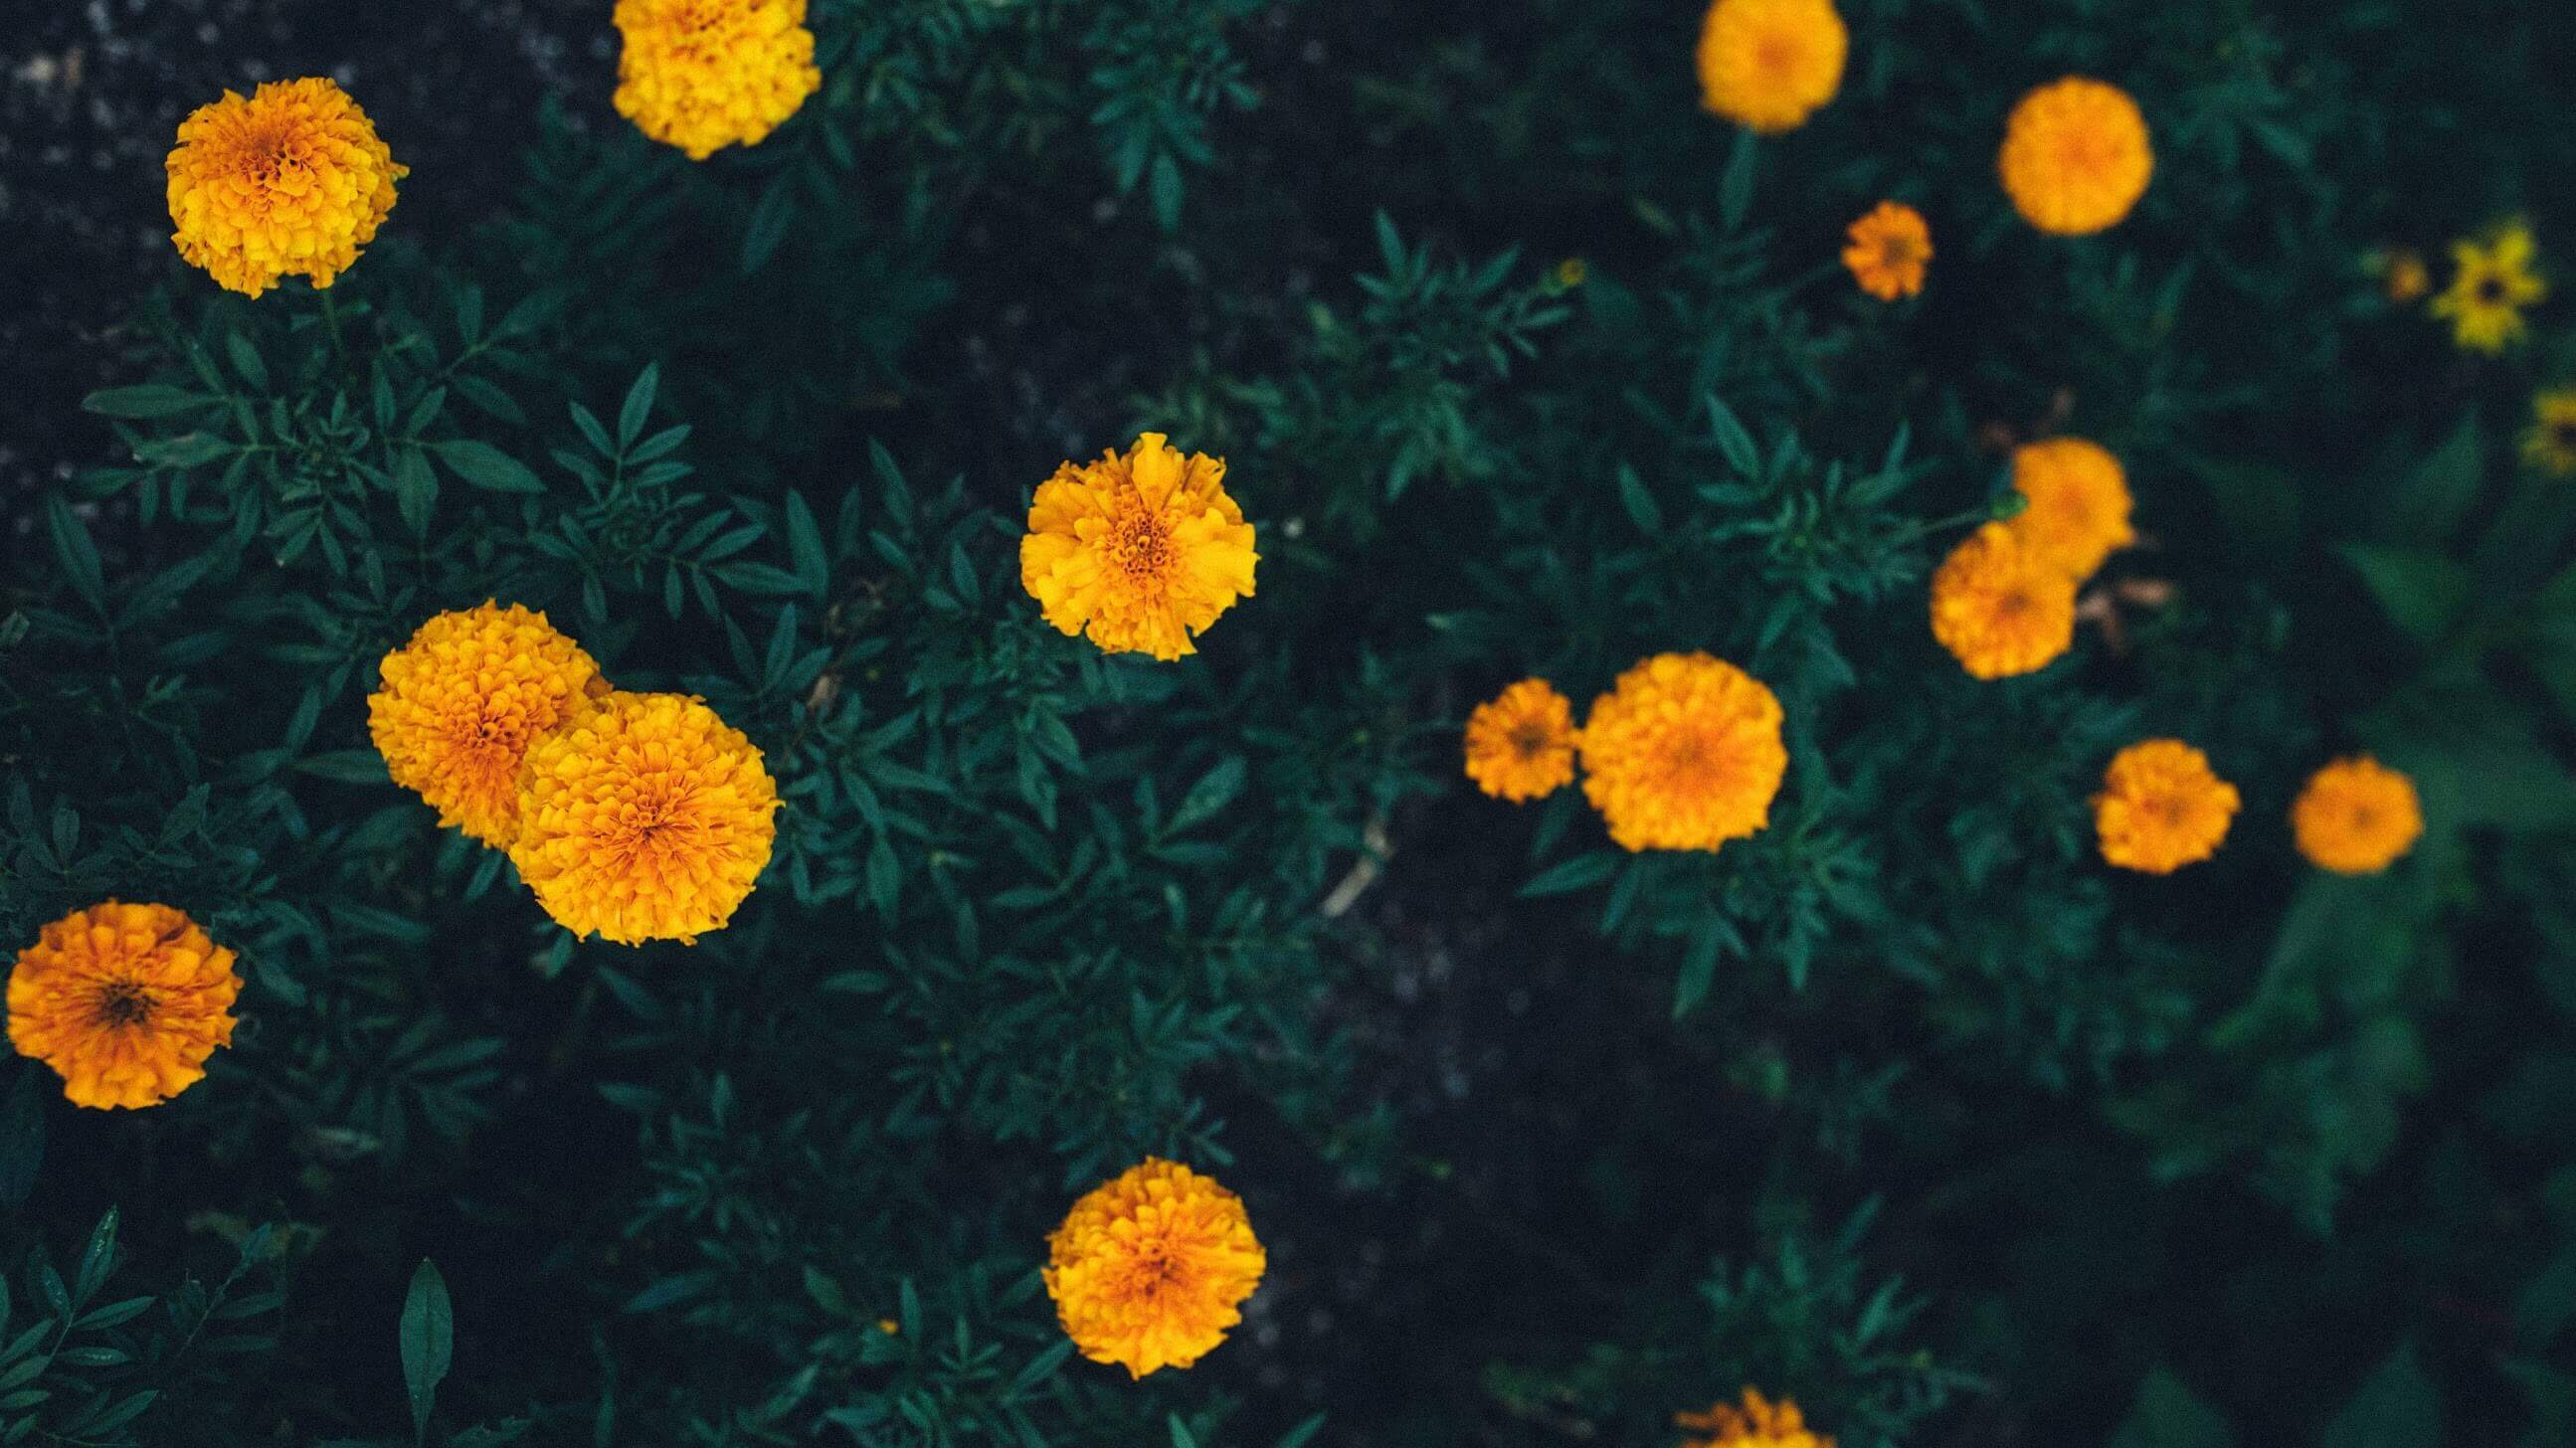 Marigolds deter wasps